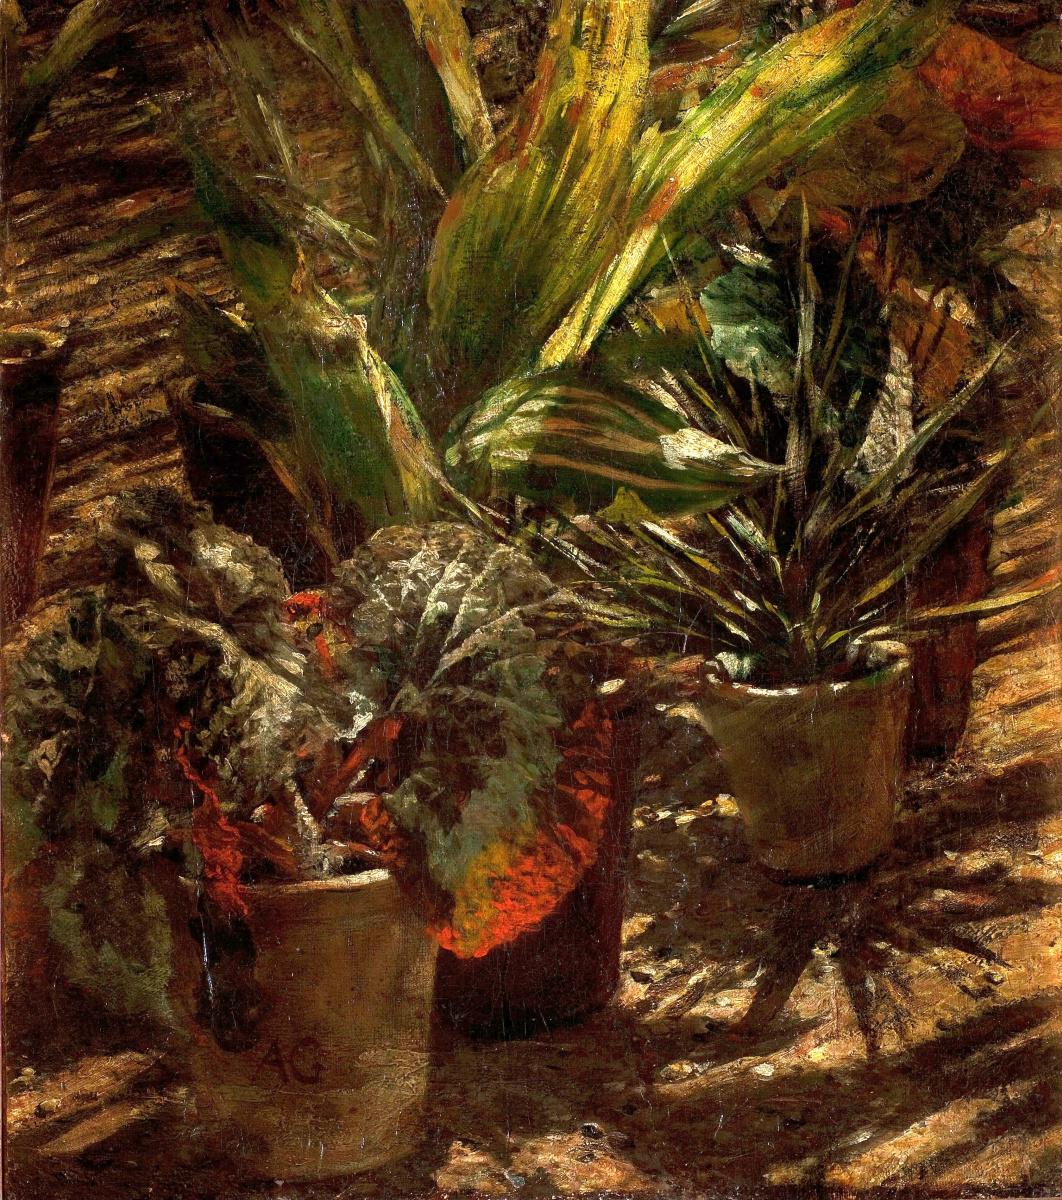 Alexander Gerymski. Begonias